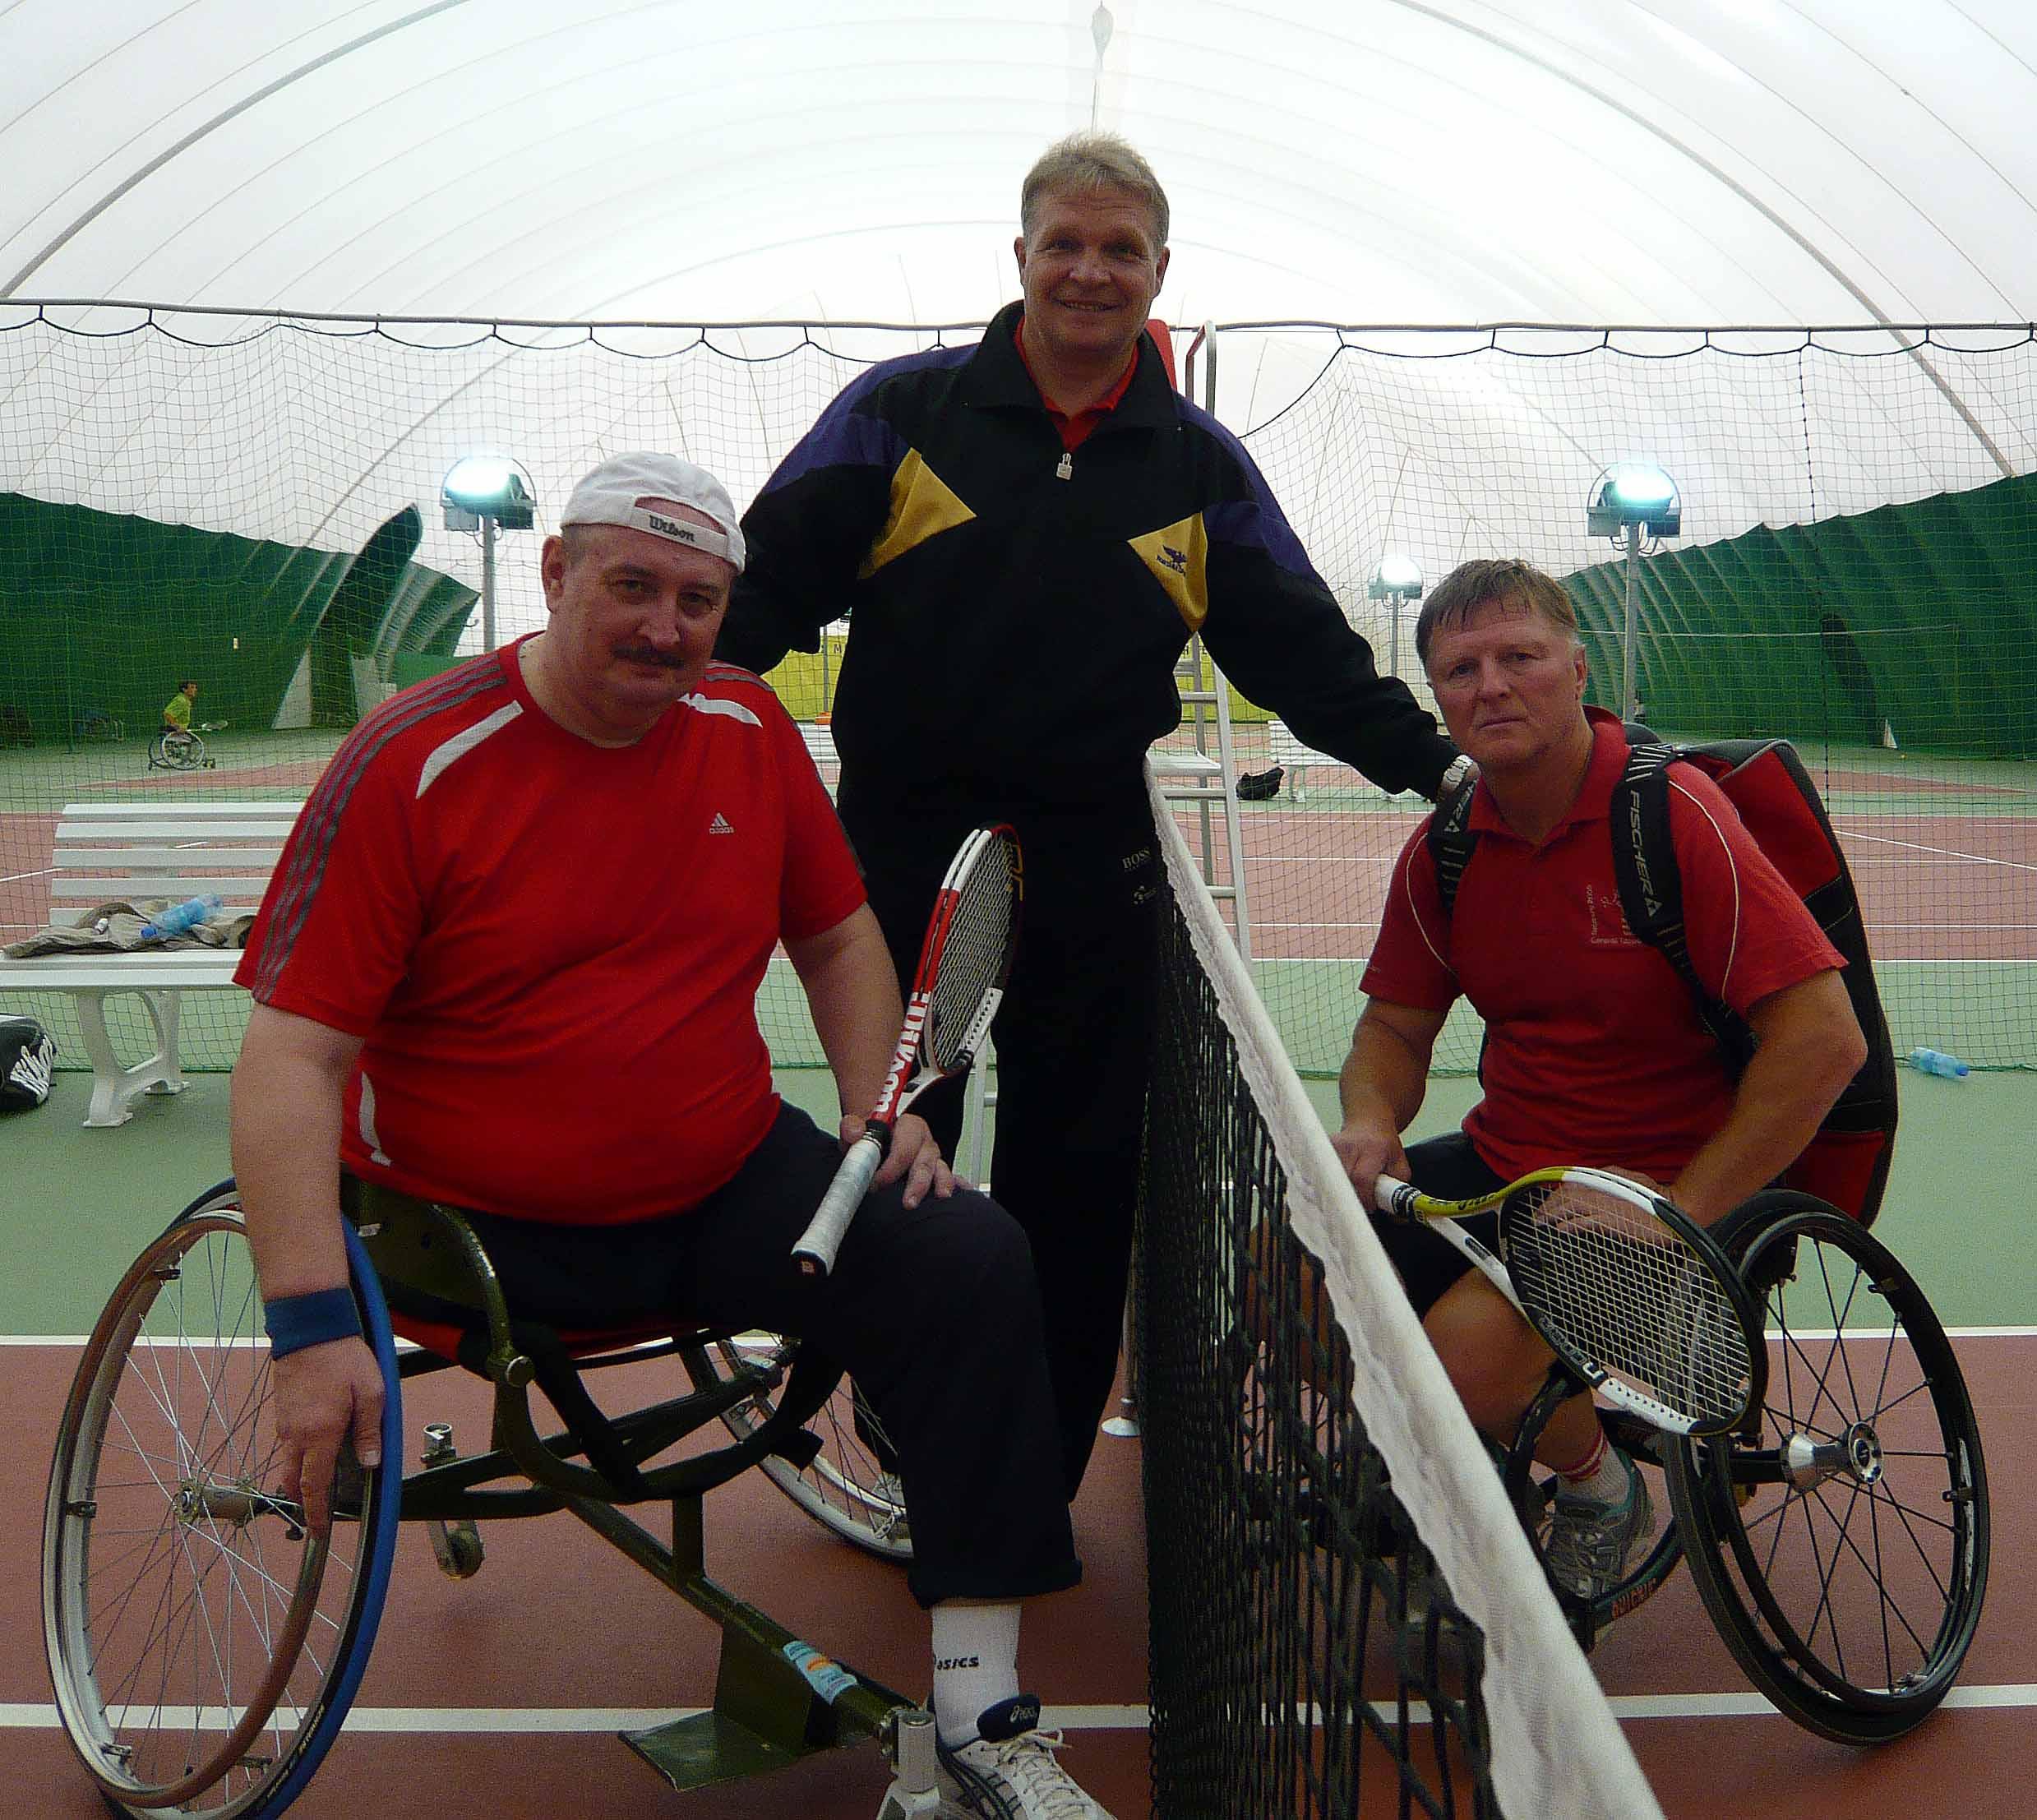 Чемпионат России по теннису среди спортсменов на колясках ТЦ Янтарь 2009